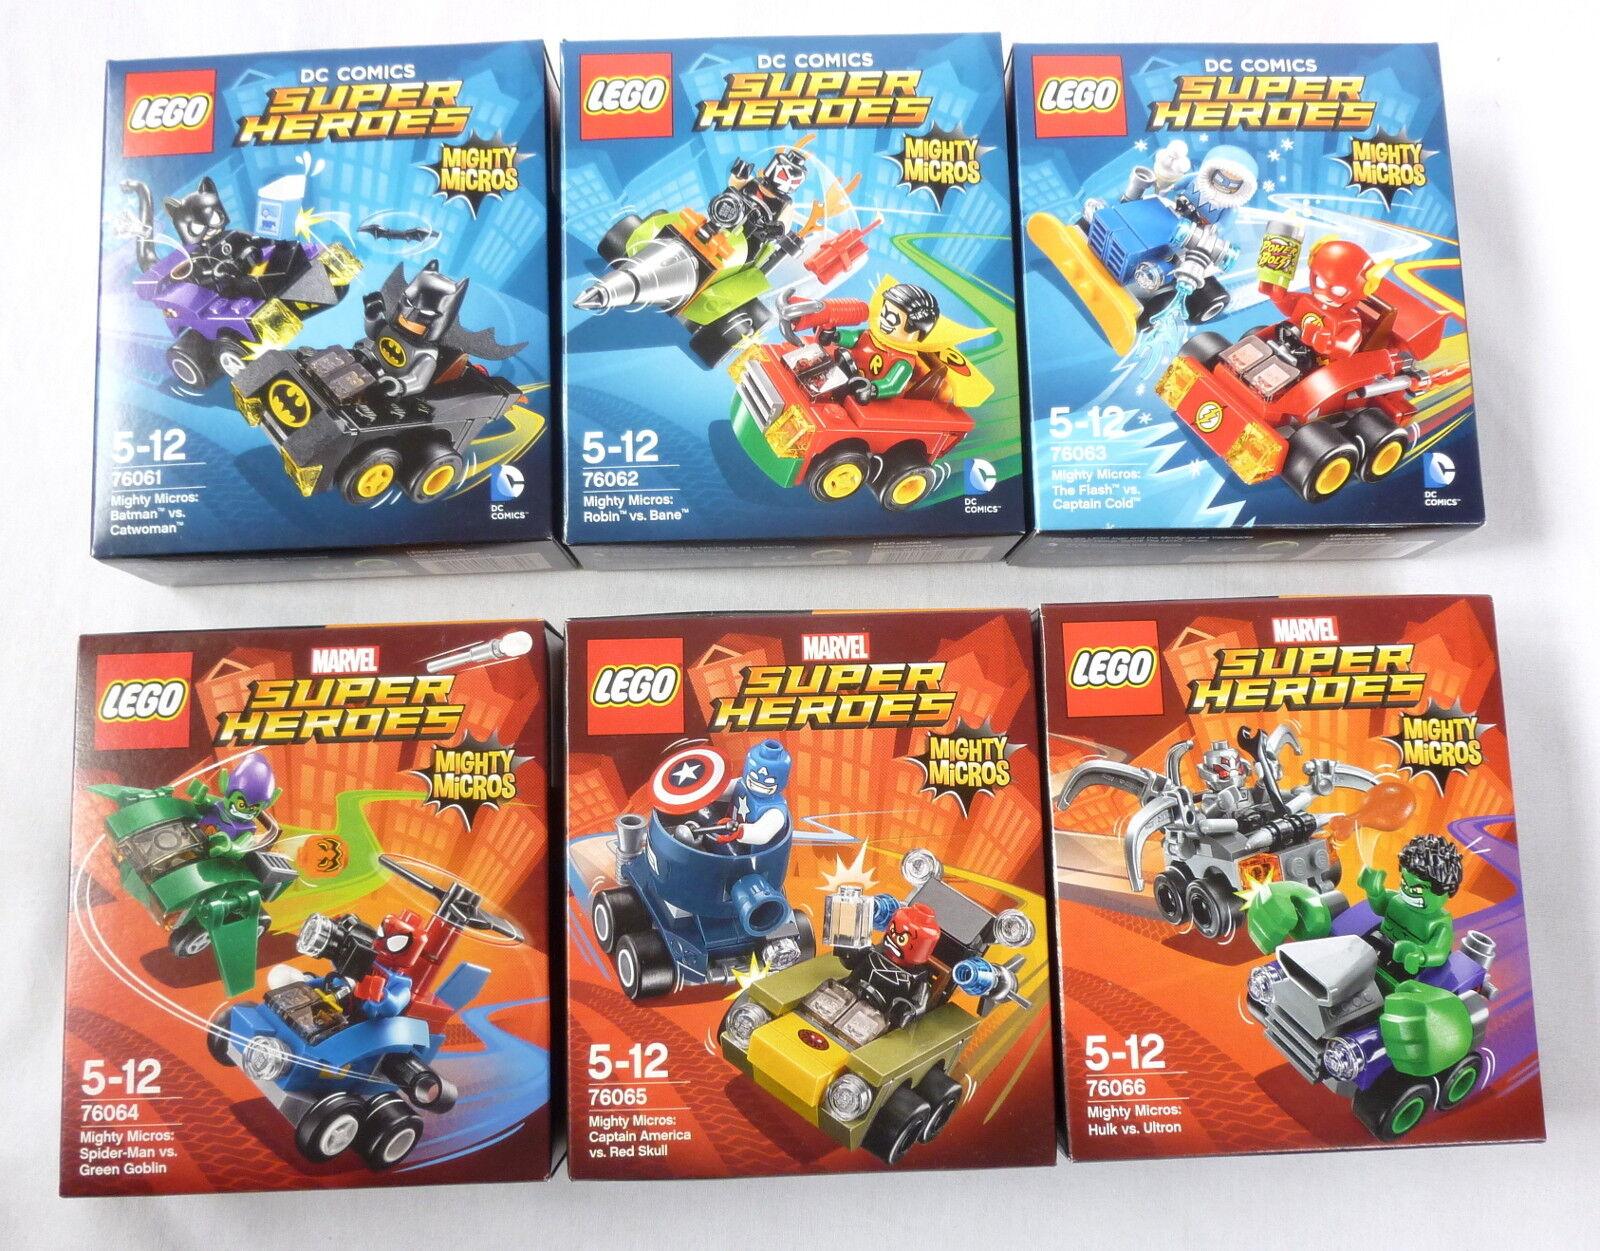 miglior reputazione LEGO Super Heroes Heroes Heroes Mighty Micros 76061 76062 76063 76064 76065 76066 MISB Series1  acquisto limitato